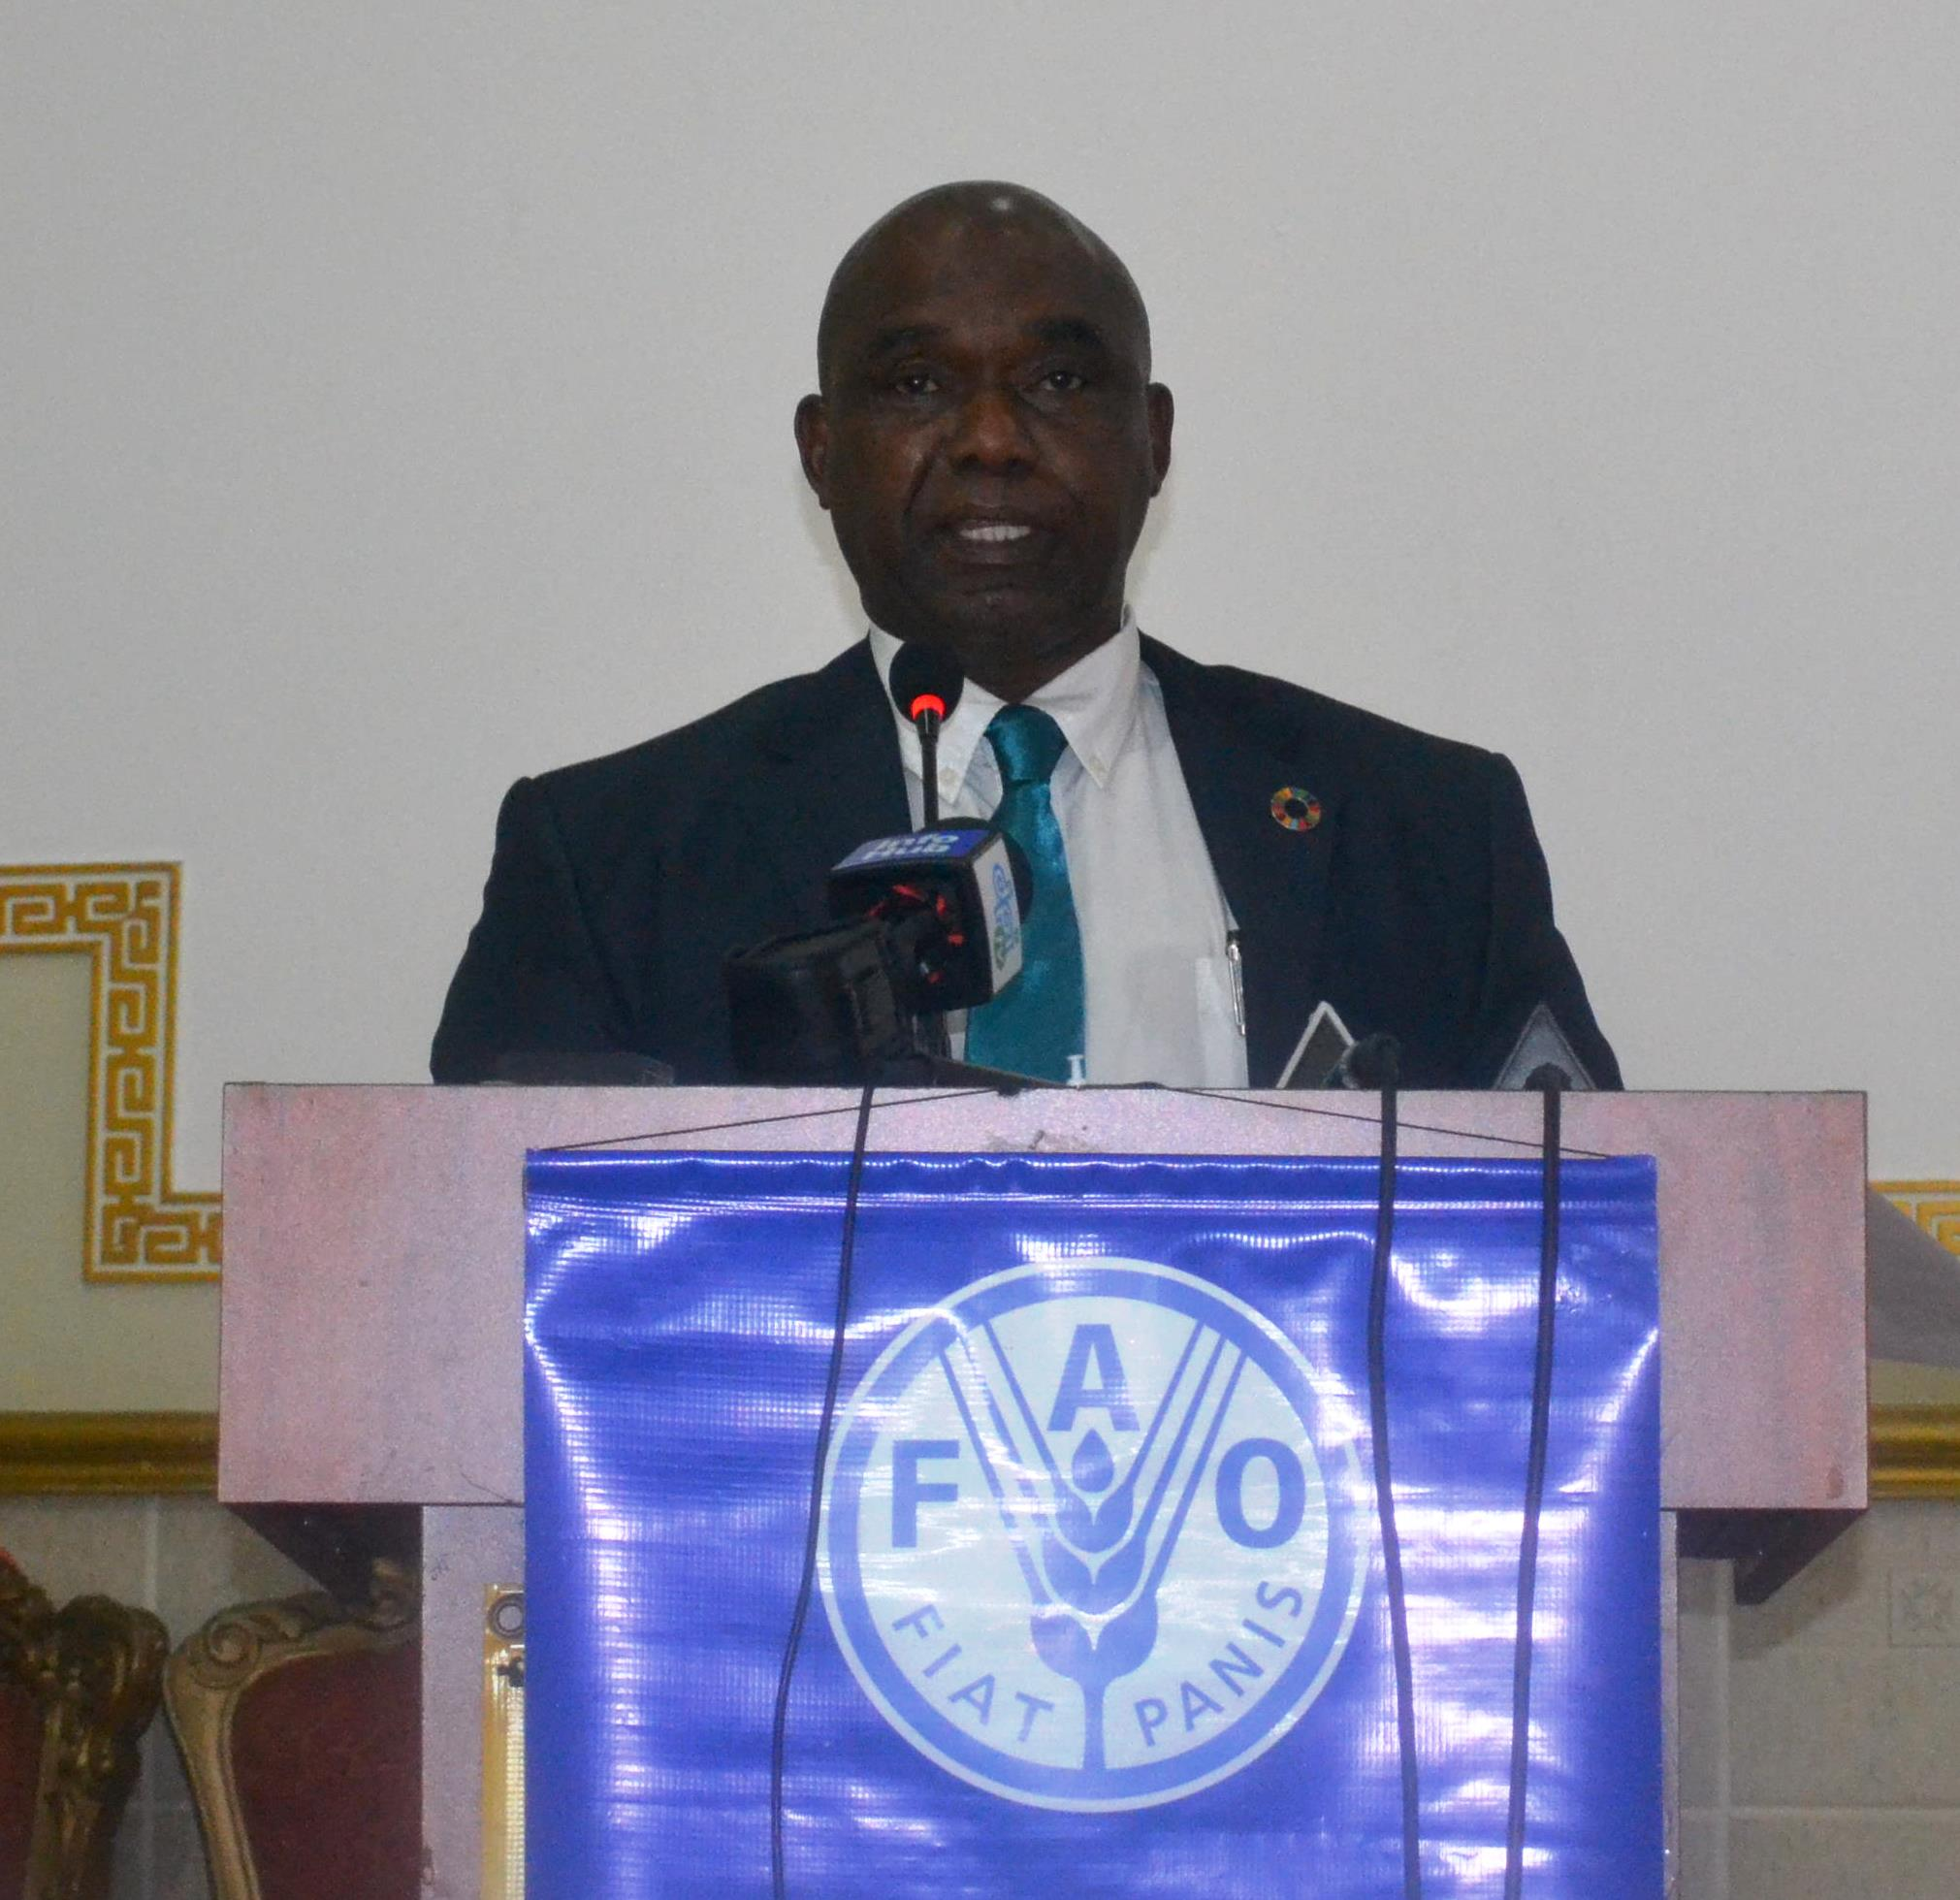 Mr. Reuben Robertson, Guyana's FAO Representative